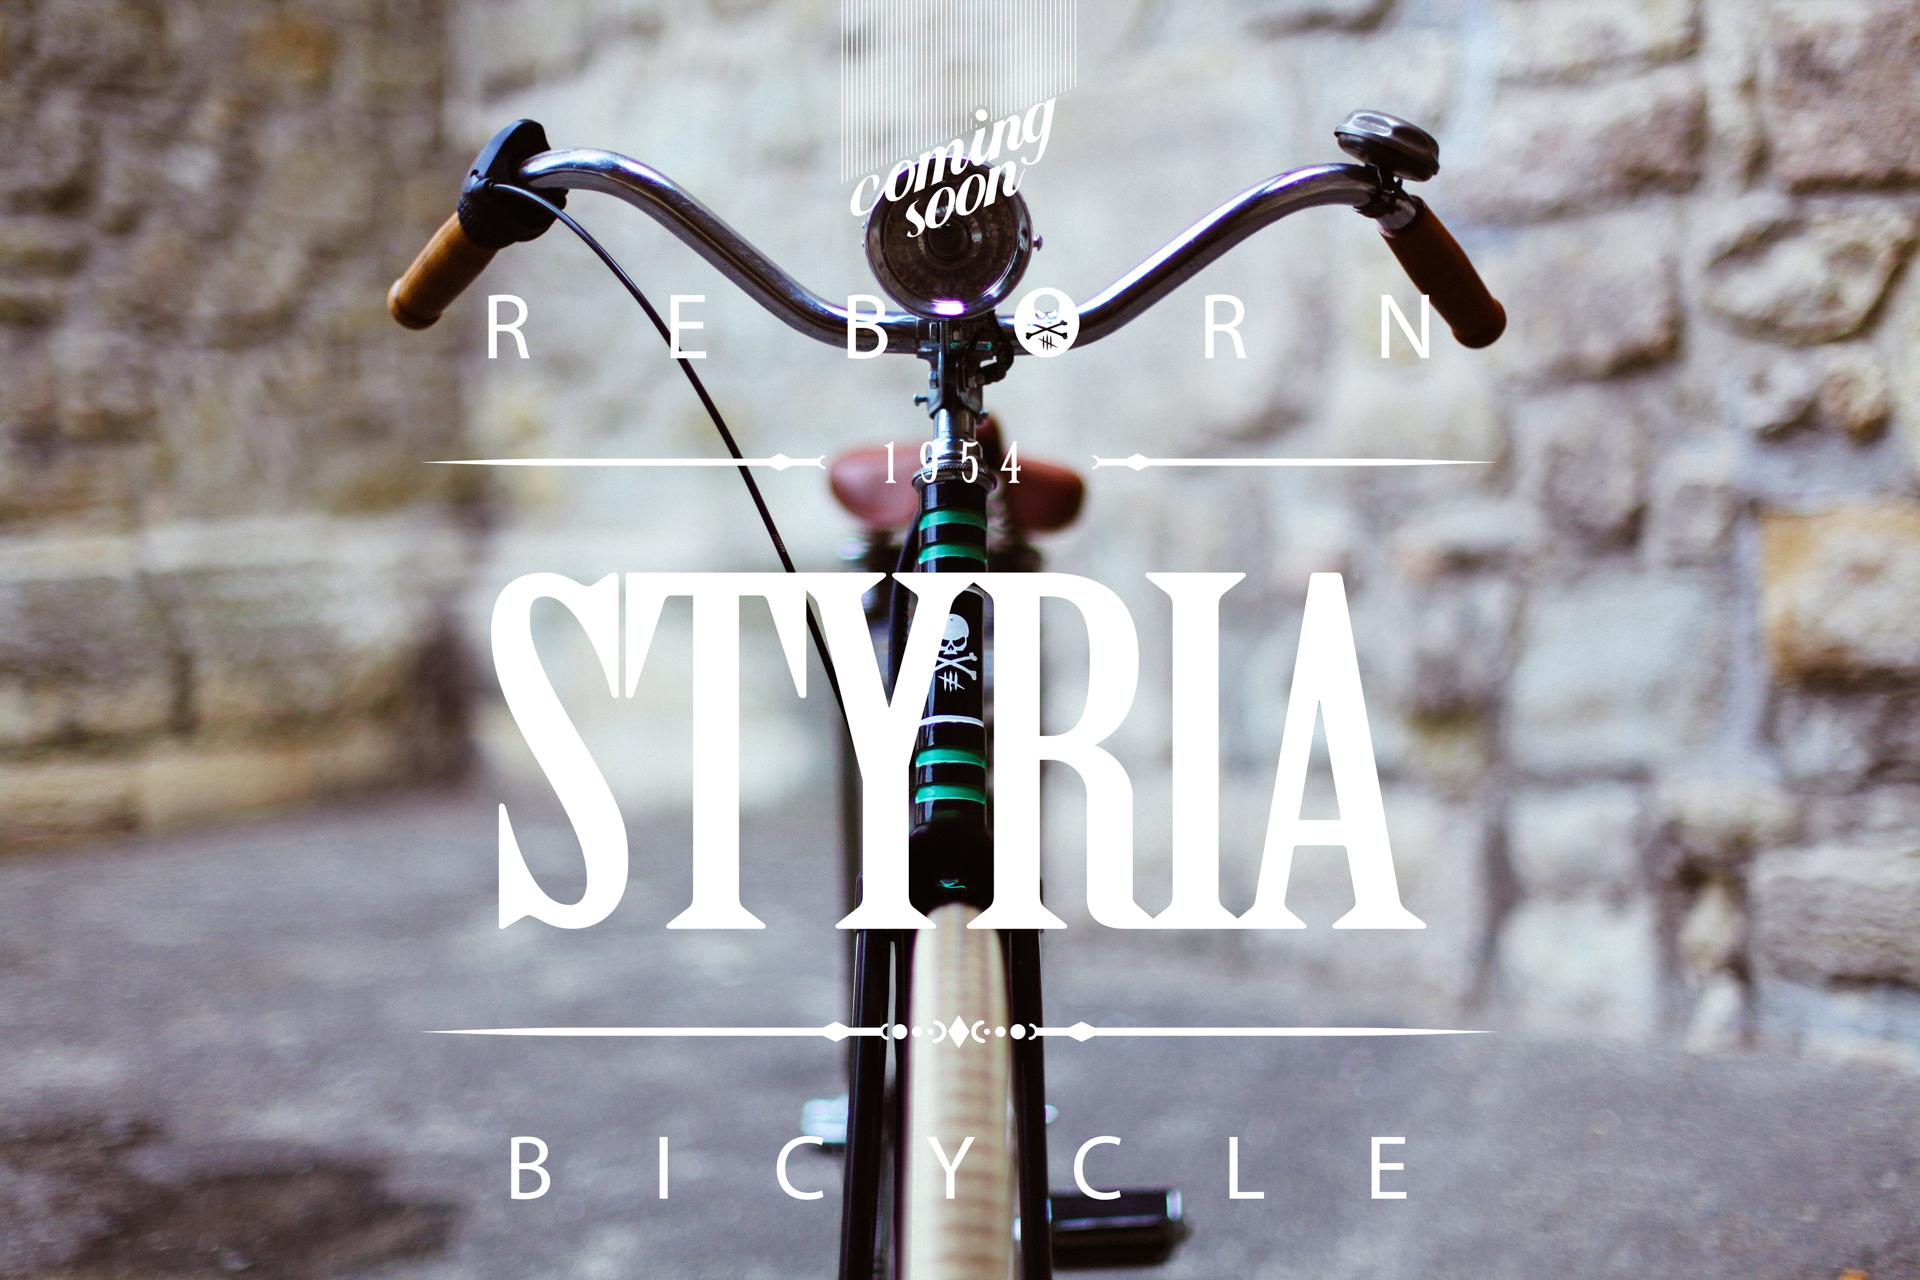 Coming-soon-Styria